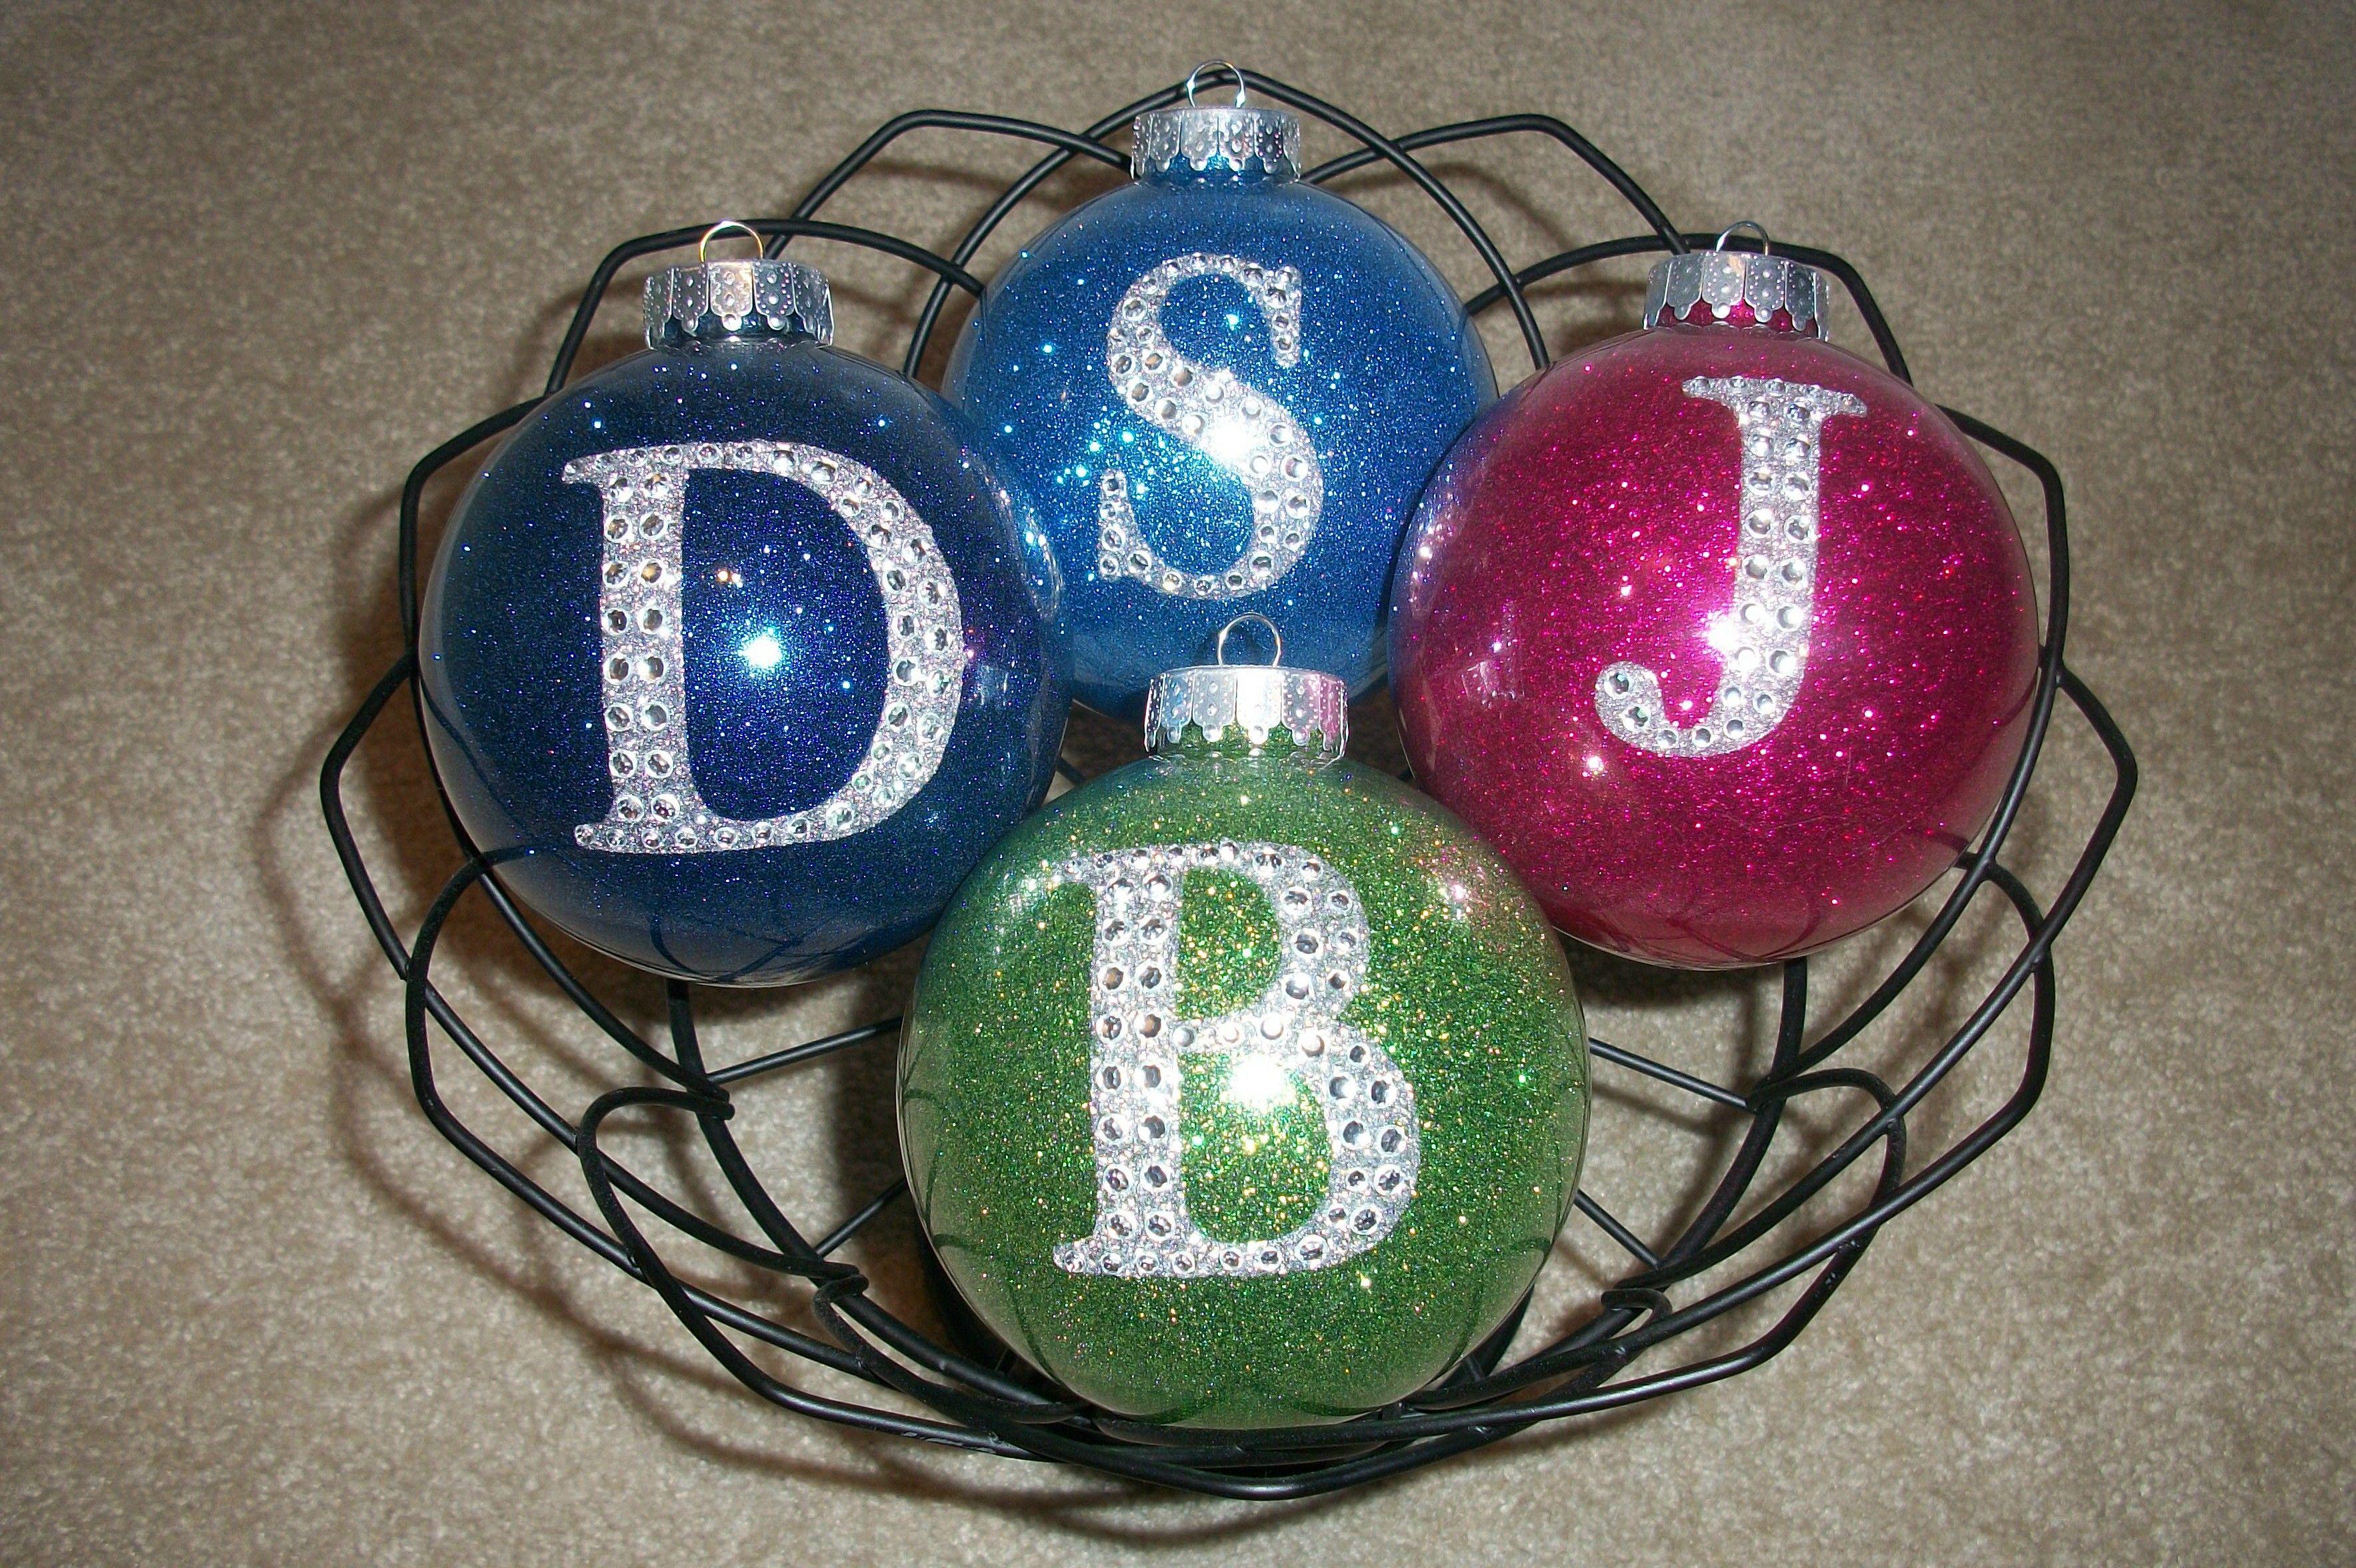 Personalized Glitter Ball Ornaments!